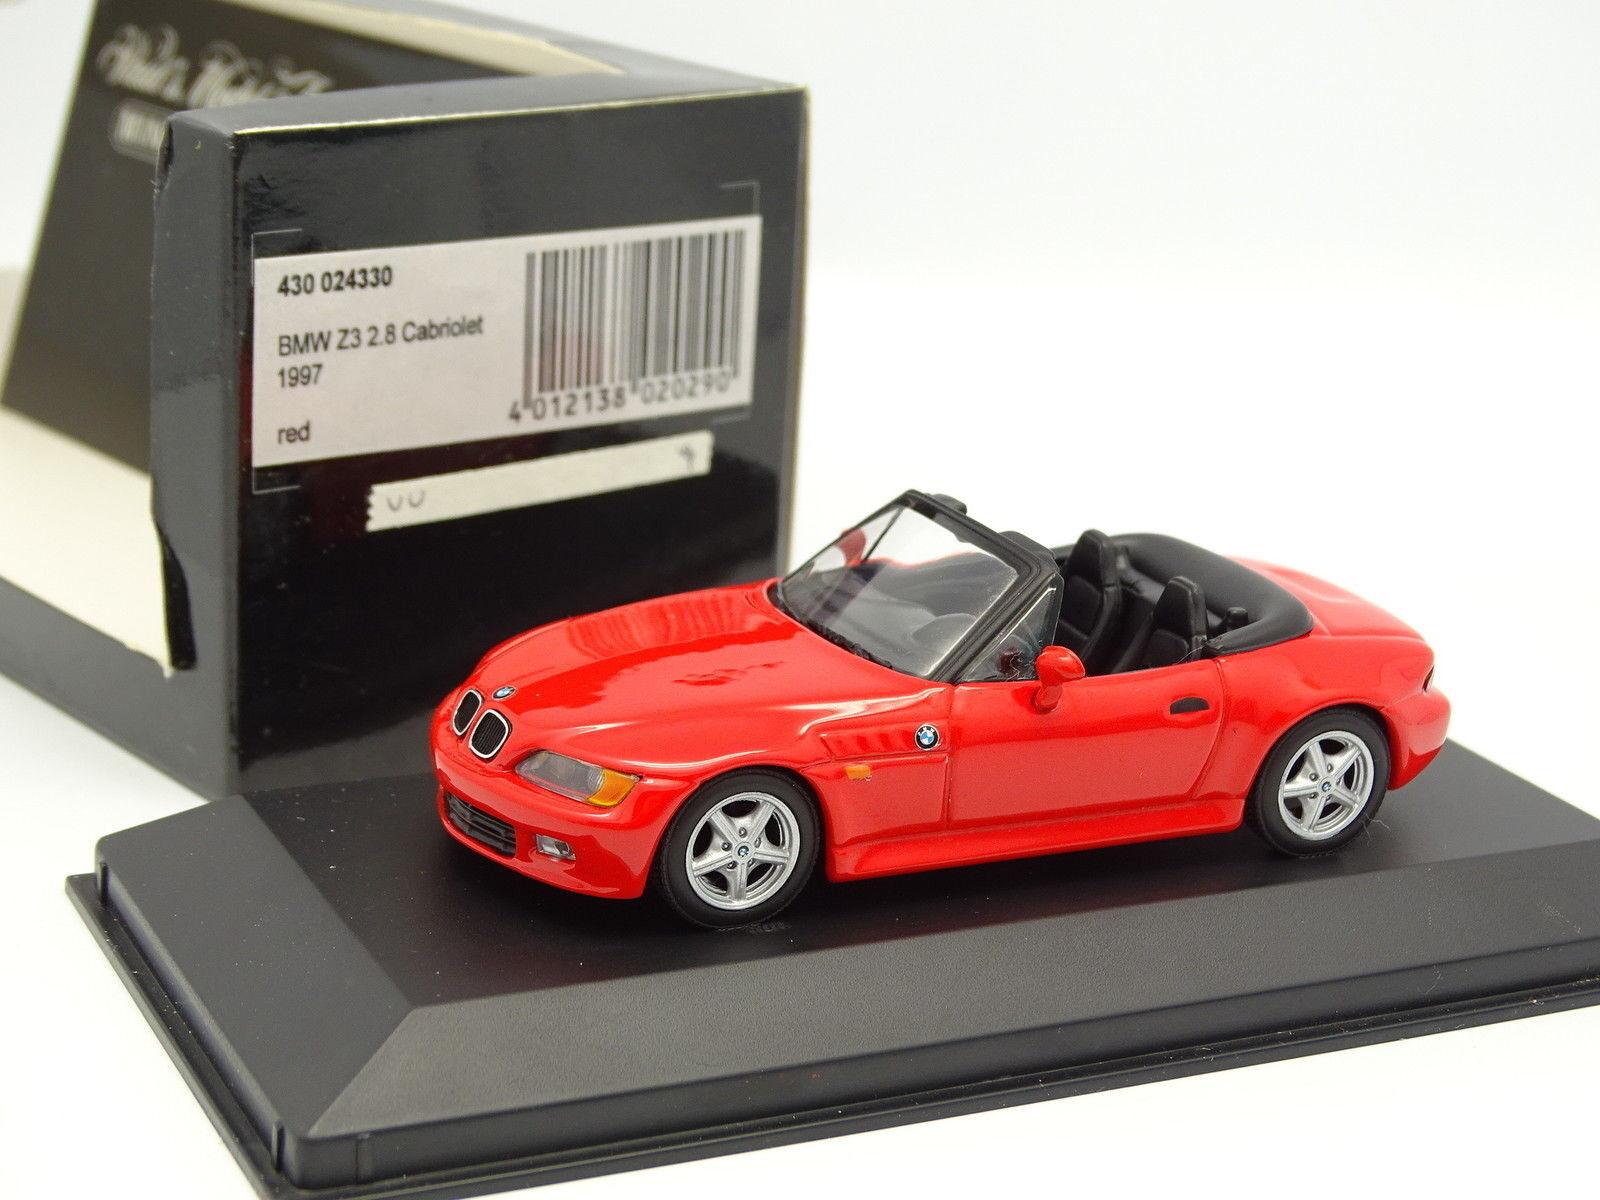 Minichamps 1 43 - BMW Z3 2.8 2.8 2.8 Cabriolet 1997 red 108b90